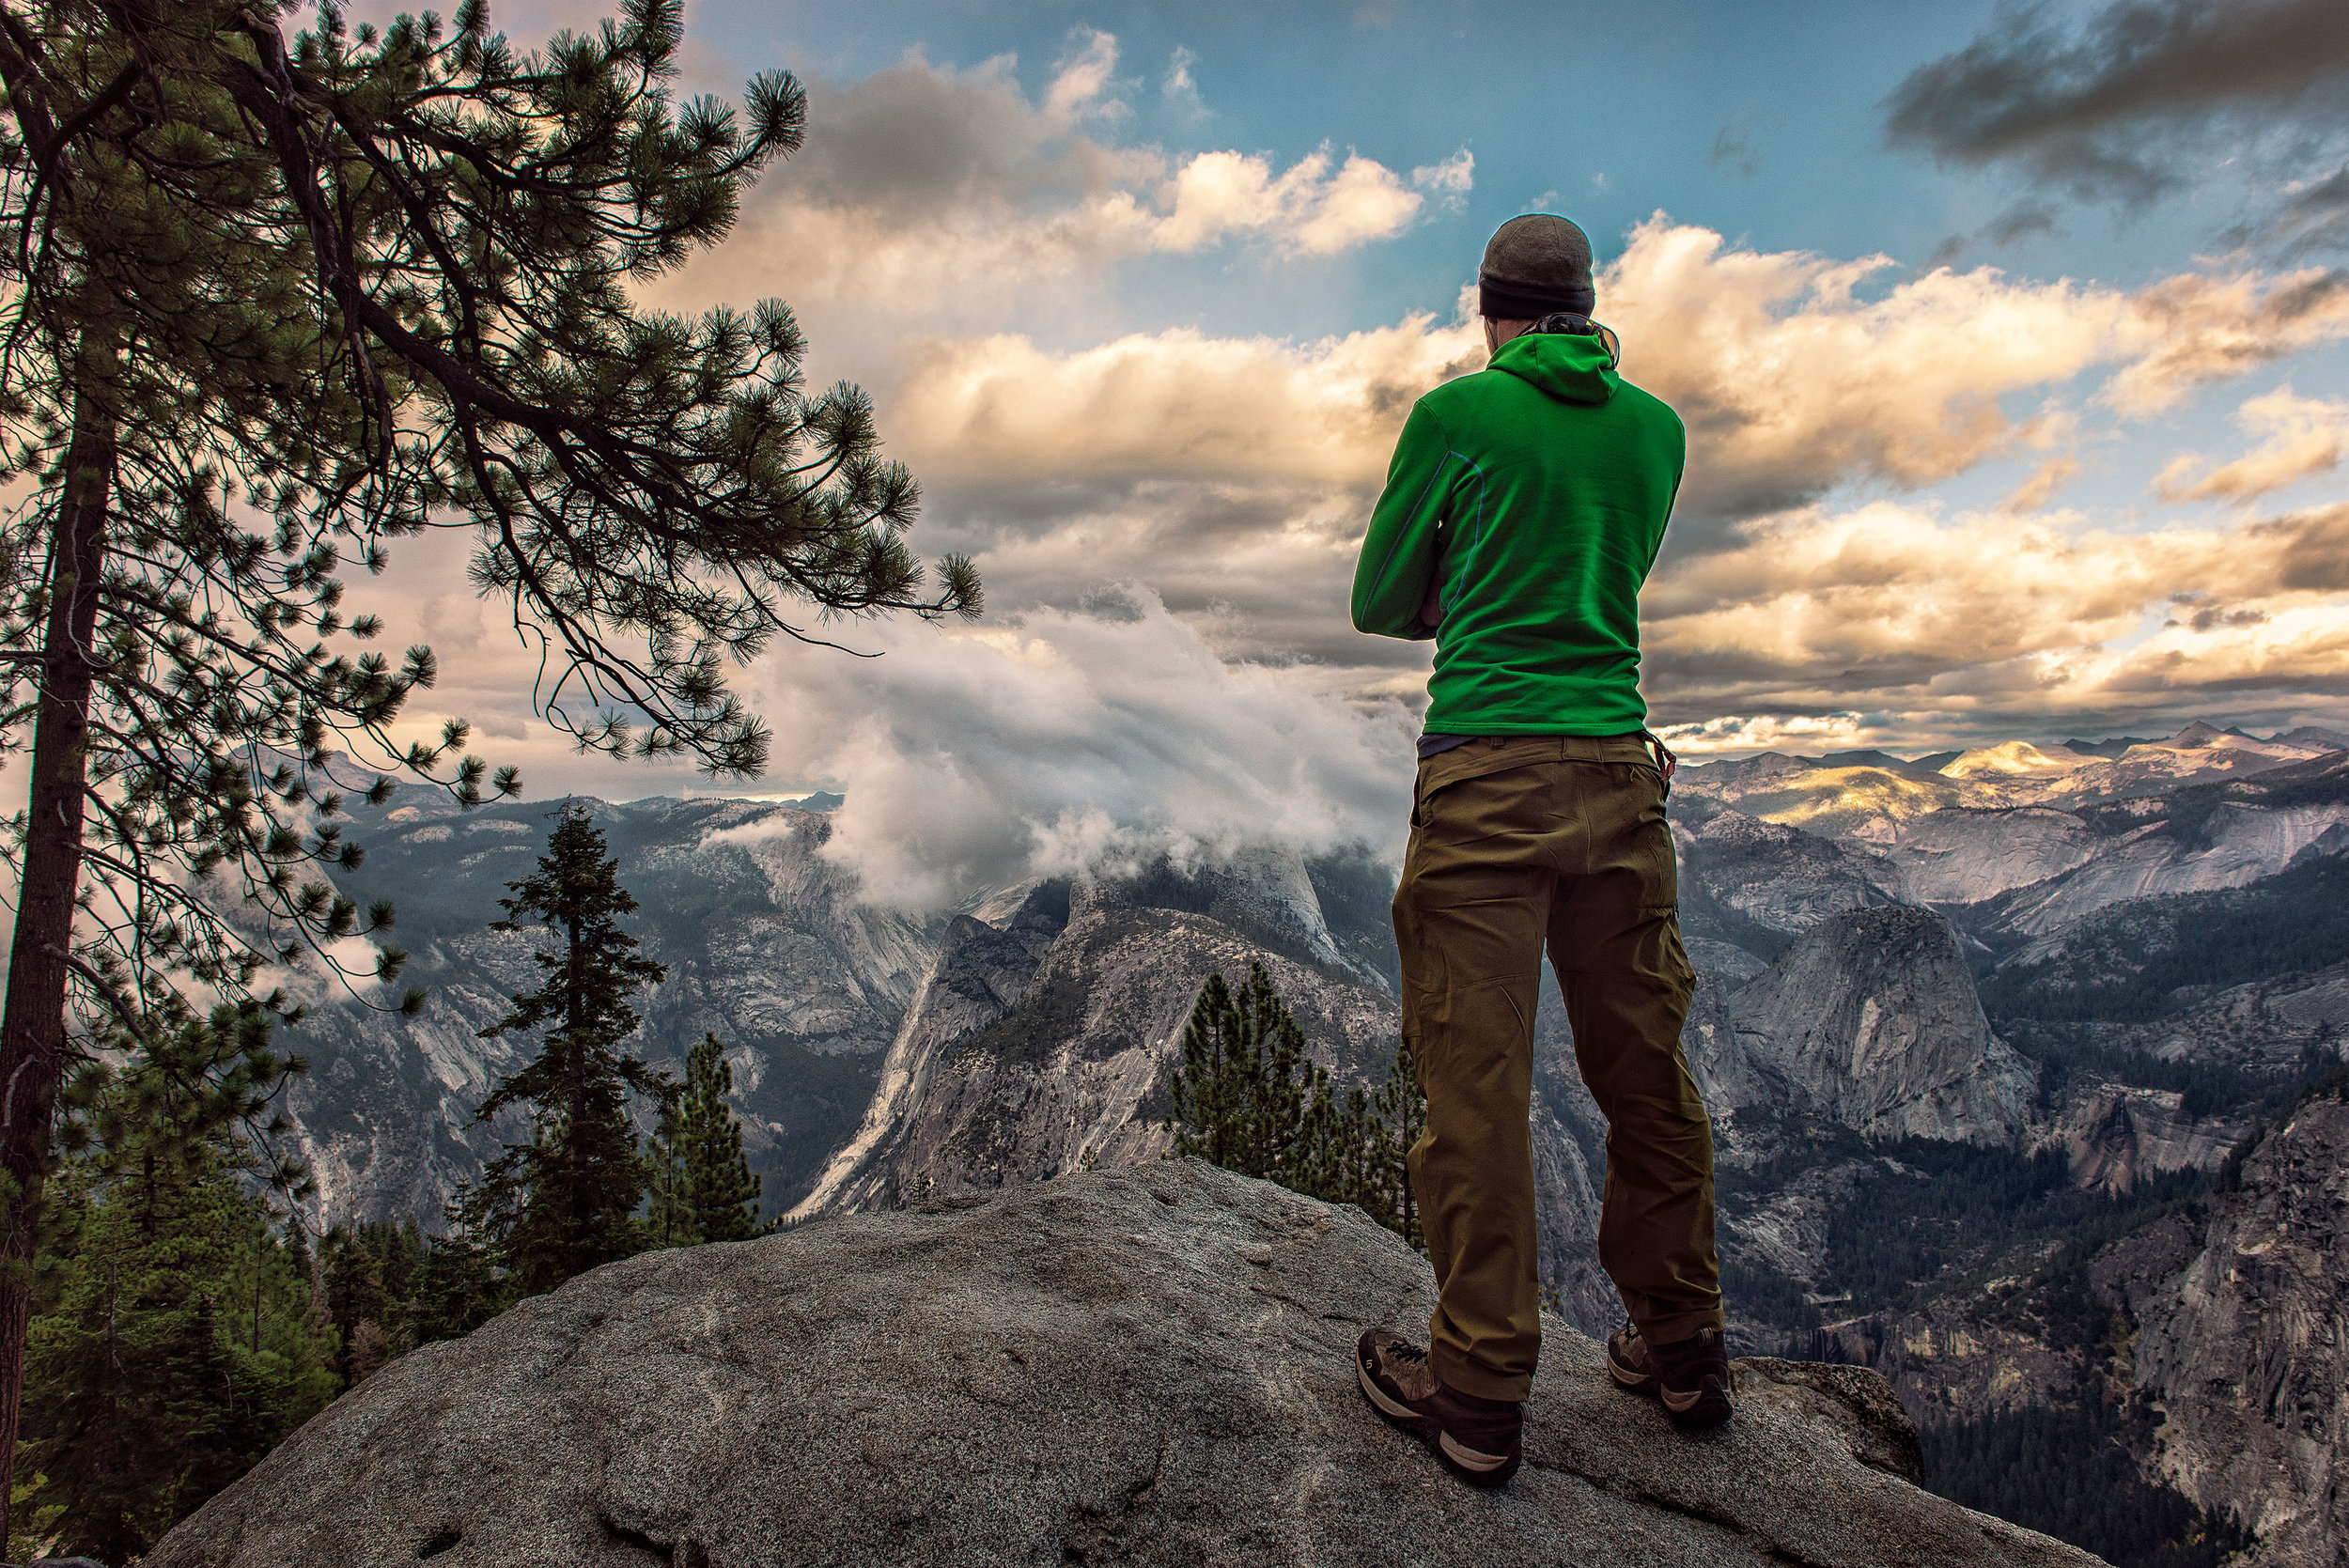 austin-trigg-wing-suit-base-jump-fly-Half-Dome-yosemite-lifestyle-california-adventure-thrill-seeking-clouds-sunset.jpg